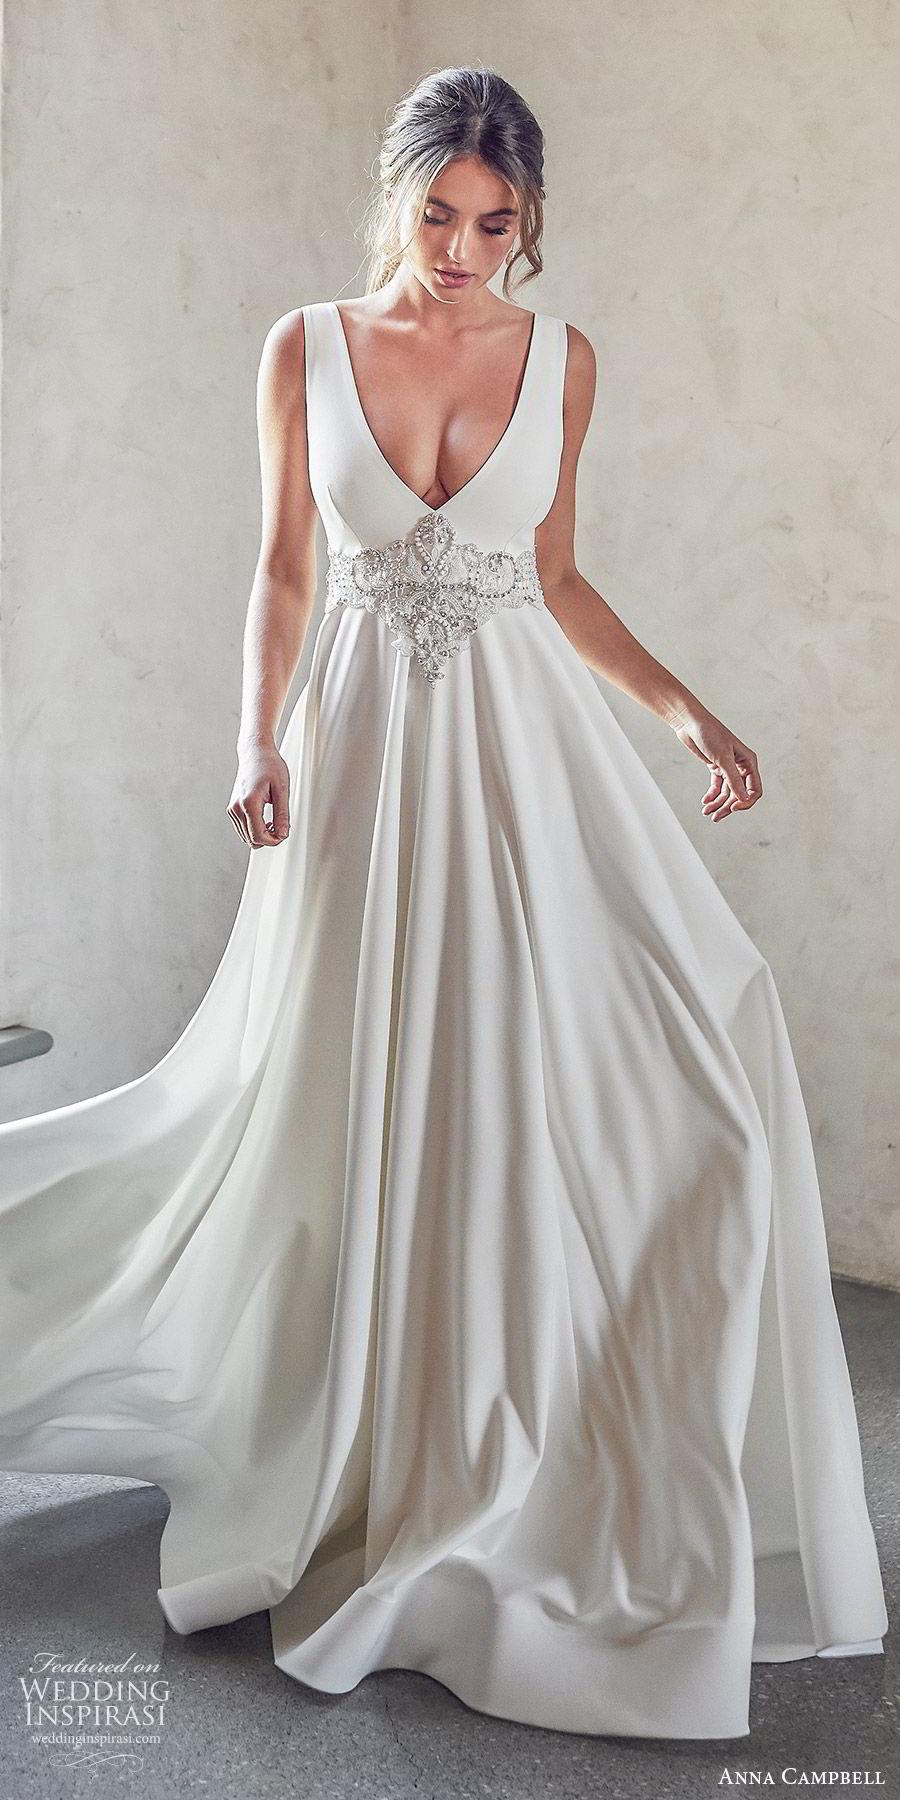 anna campbell 2020 bridal sleeveless thick straps deep v neckline embellished waist ball gown a line wedding dress (7) elegant sexy clean modern open back chapel train zv